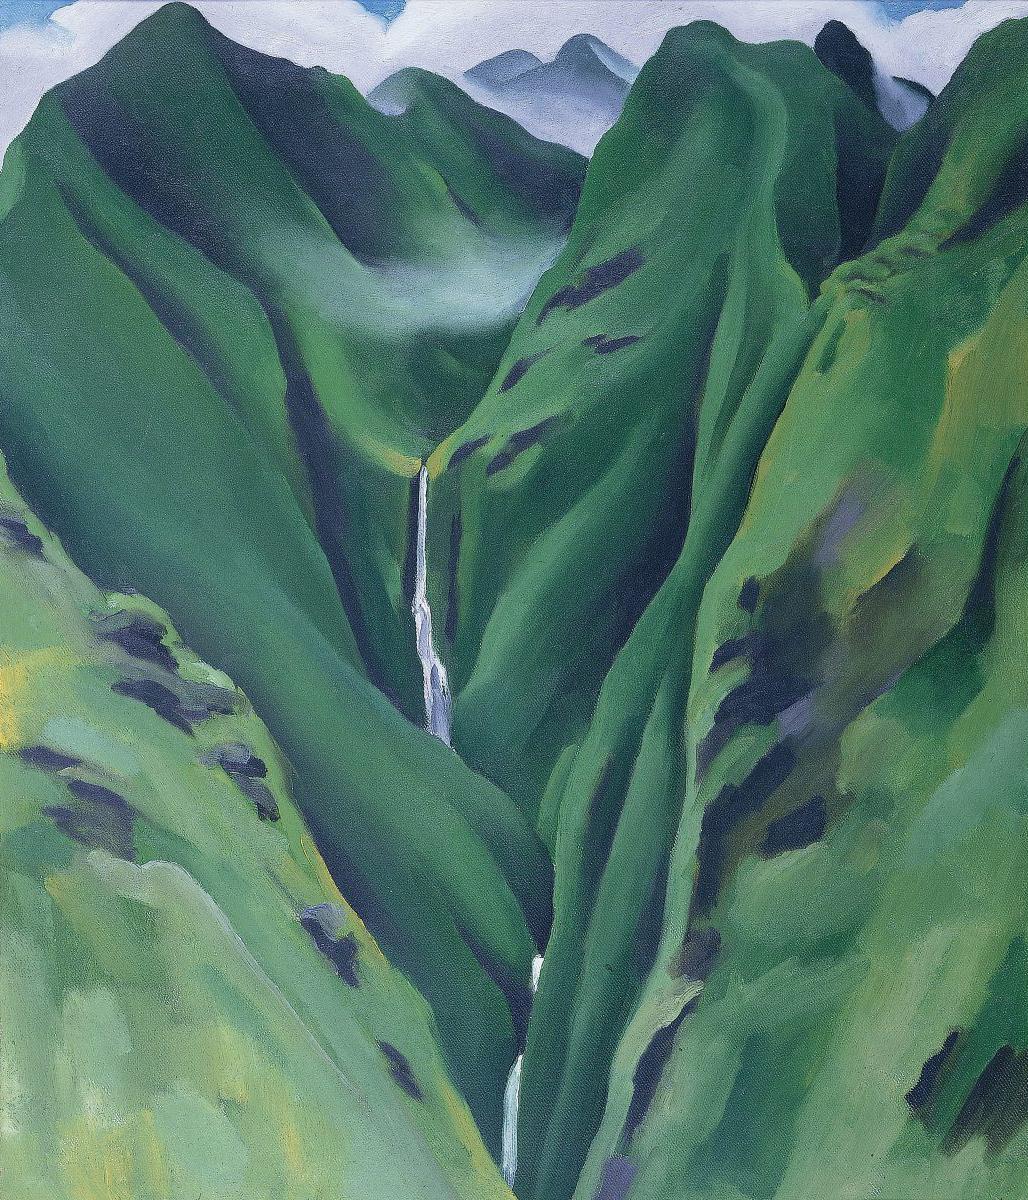 Waterfall-No.-1-Iao-Valley-Maui-4_3-1600x1200.jpg